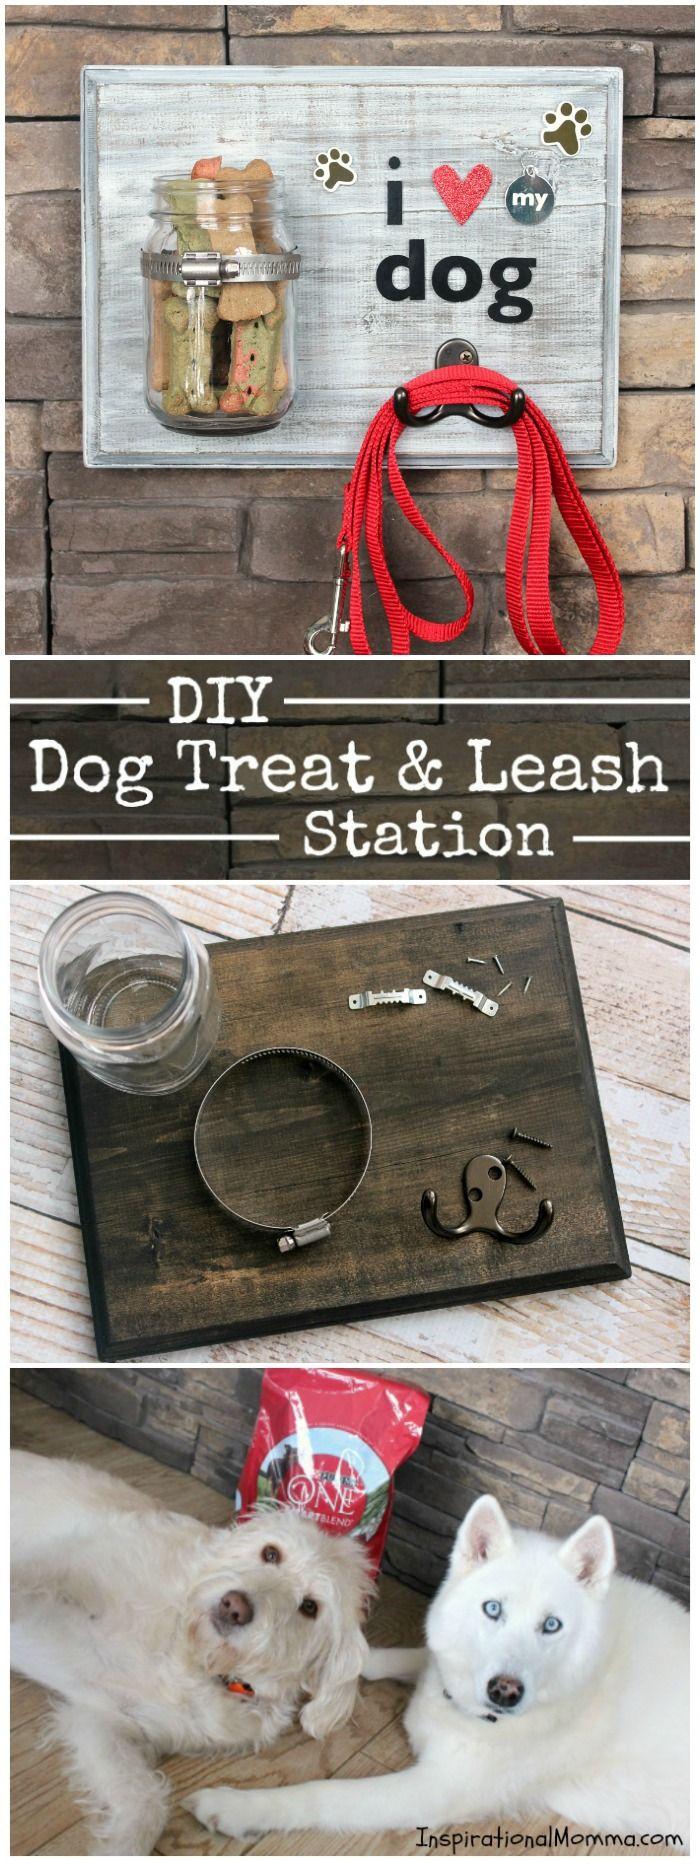 DIY Dog Treat & Leash Station   – Crafts & Creations